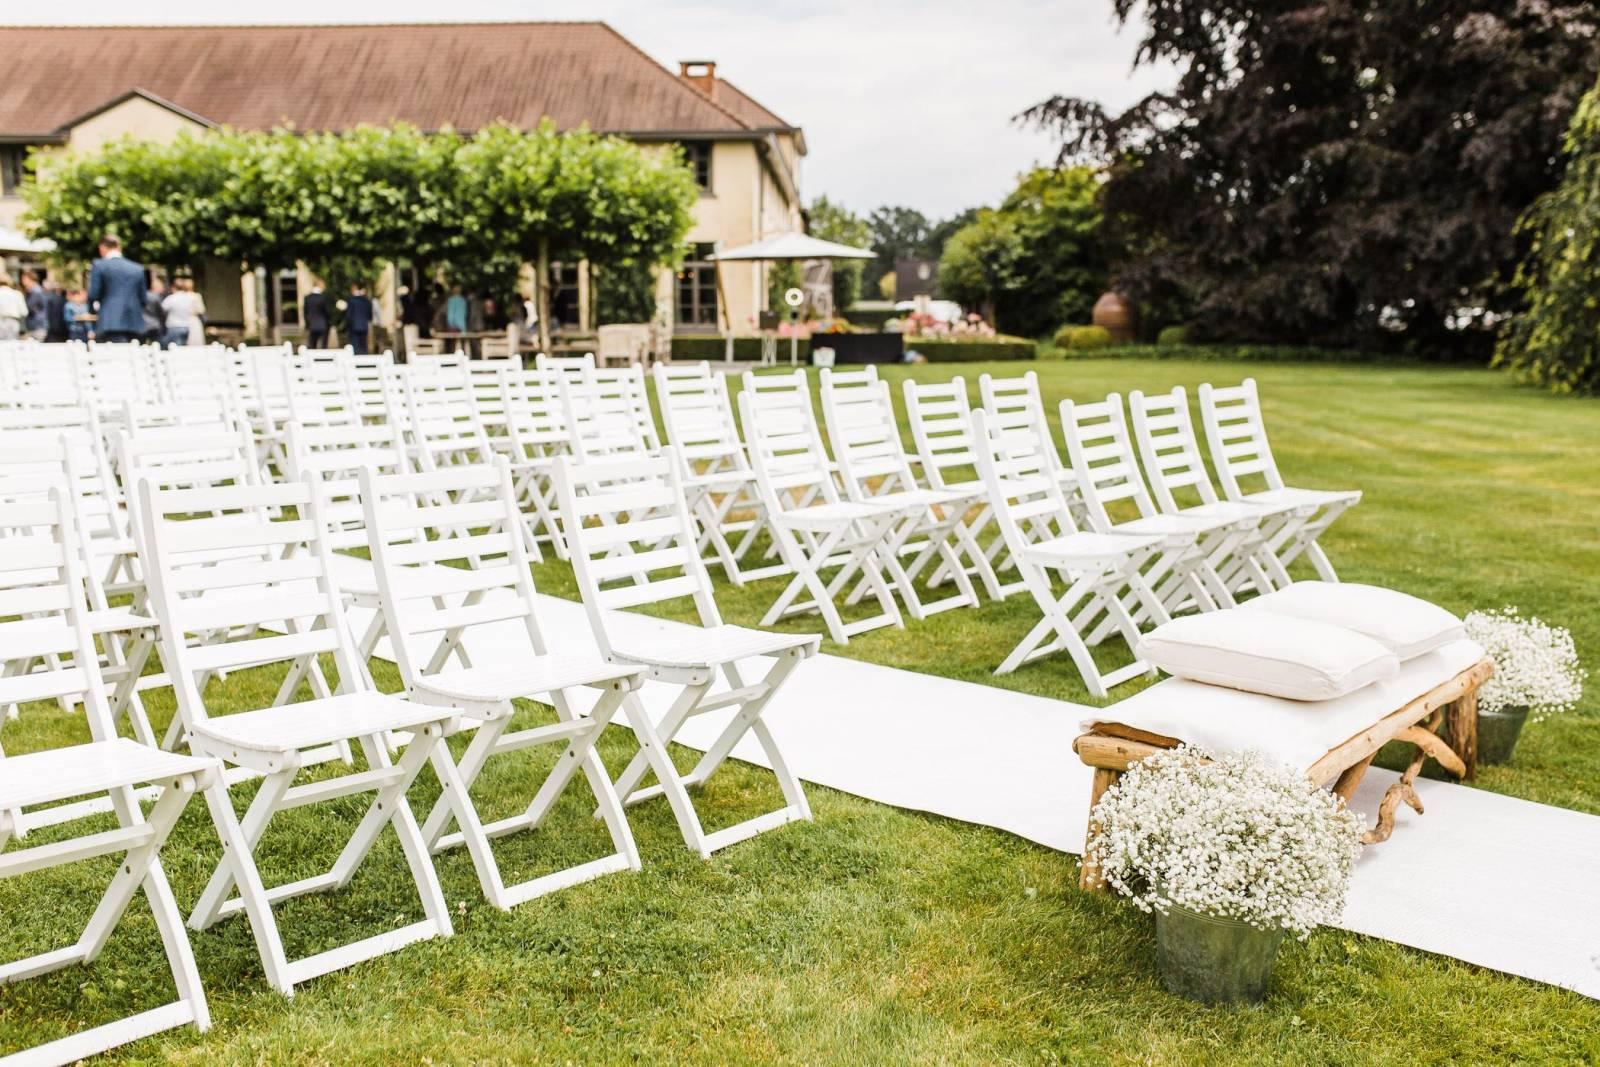 De Barrier - Feestzaal -  House of Weddings - 21